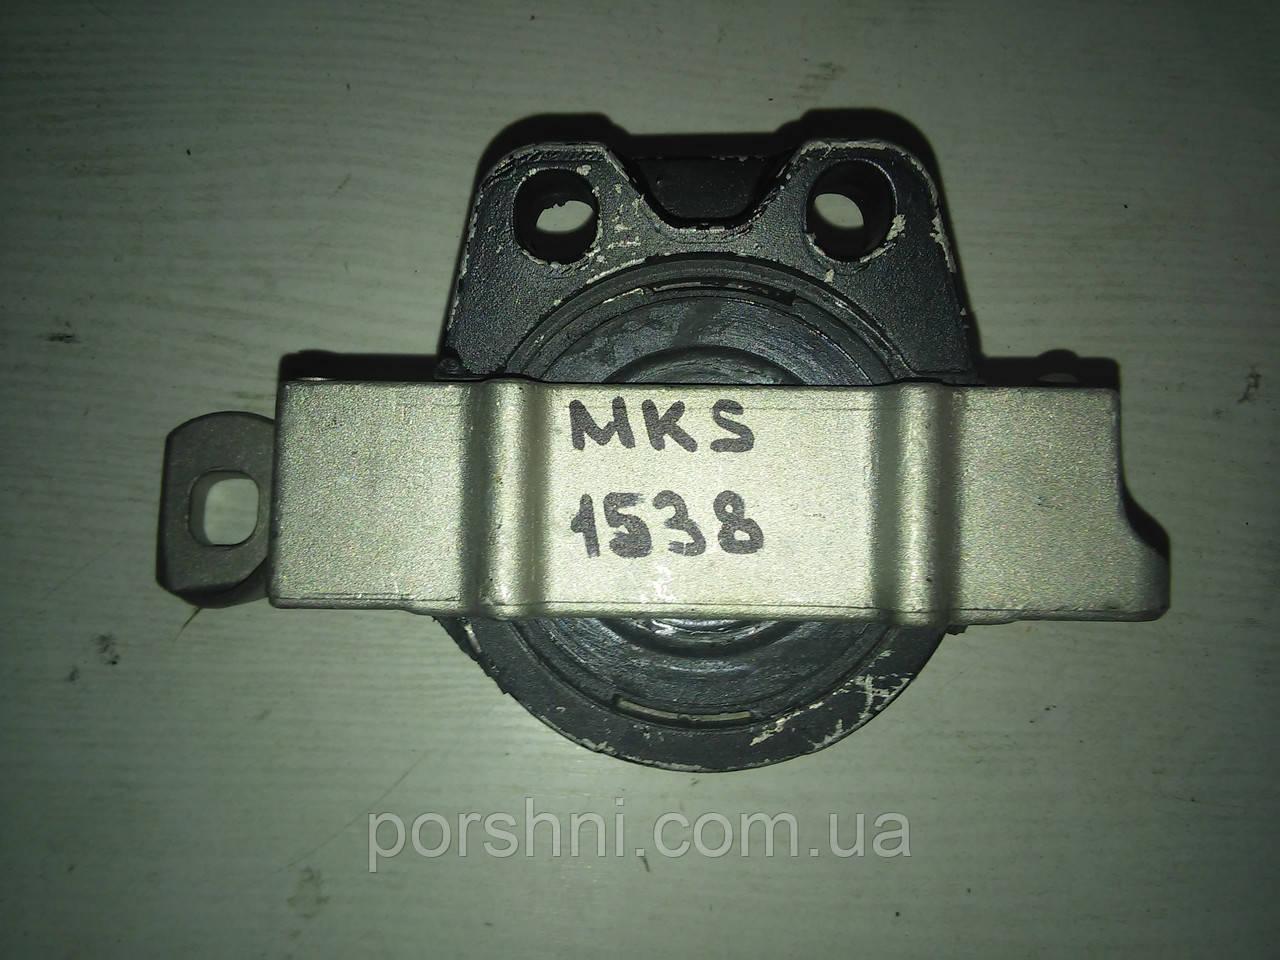 Подушка  двигателя Ford Focus II 1.6TDCi RH  MKS1538  3M516F012BG  N:1567937